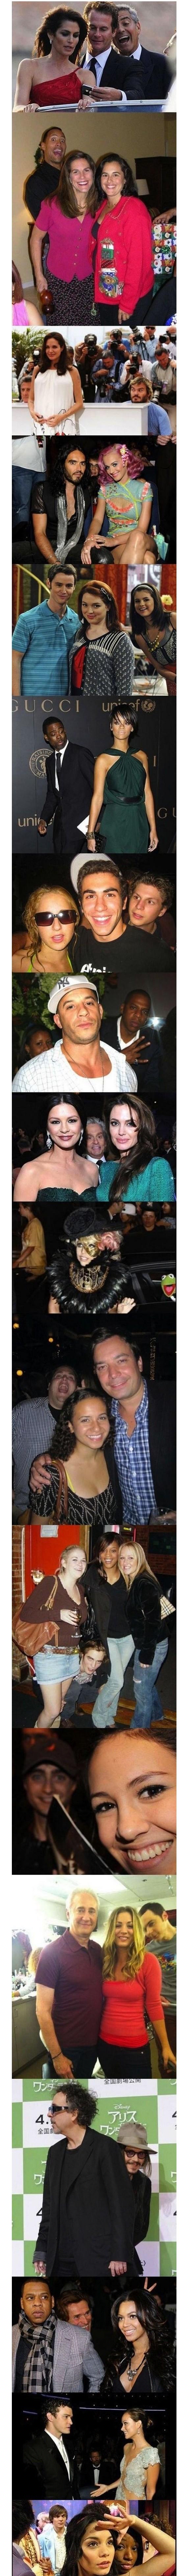 Really Cool Celebrities Photobombing!